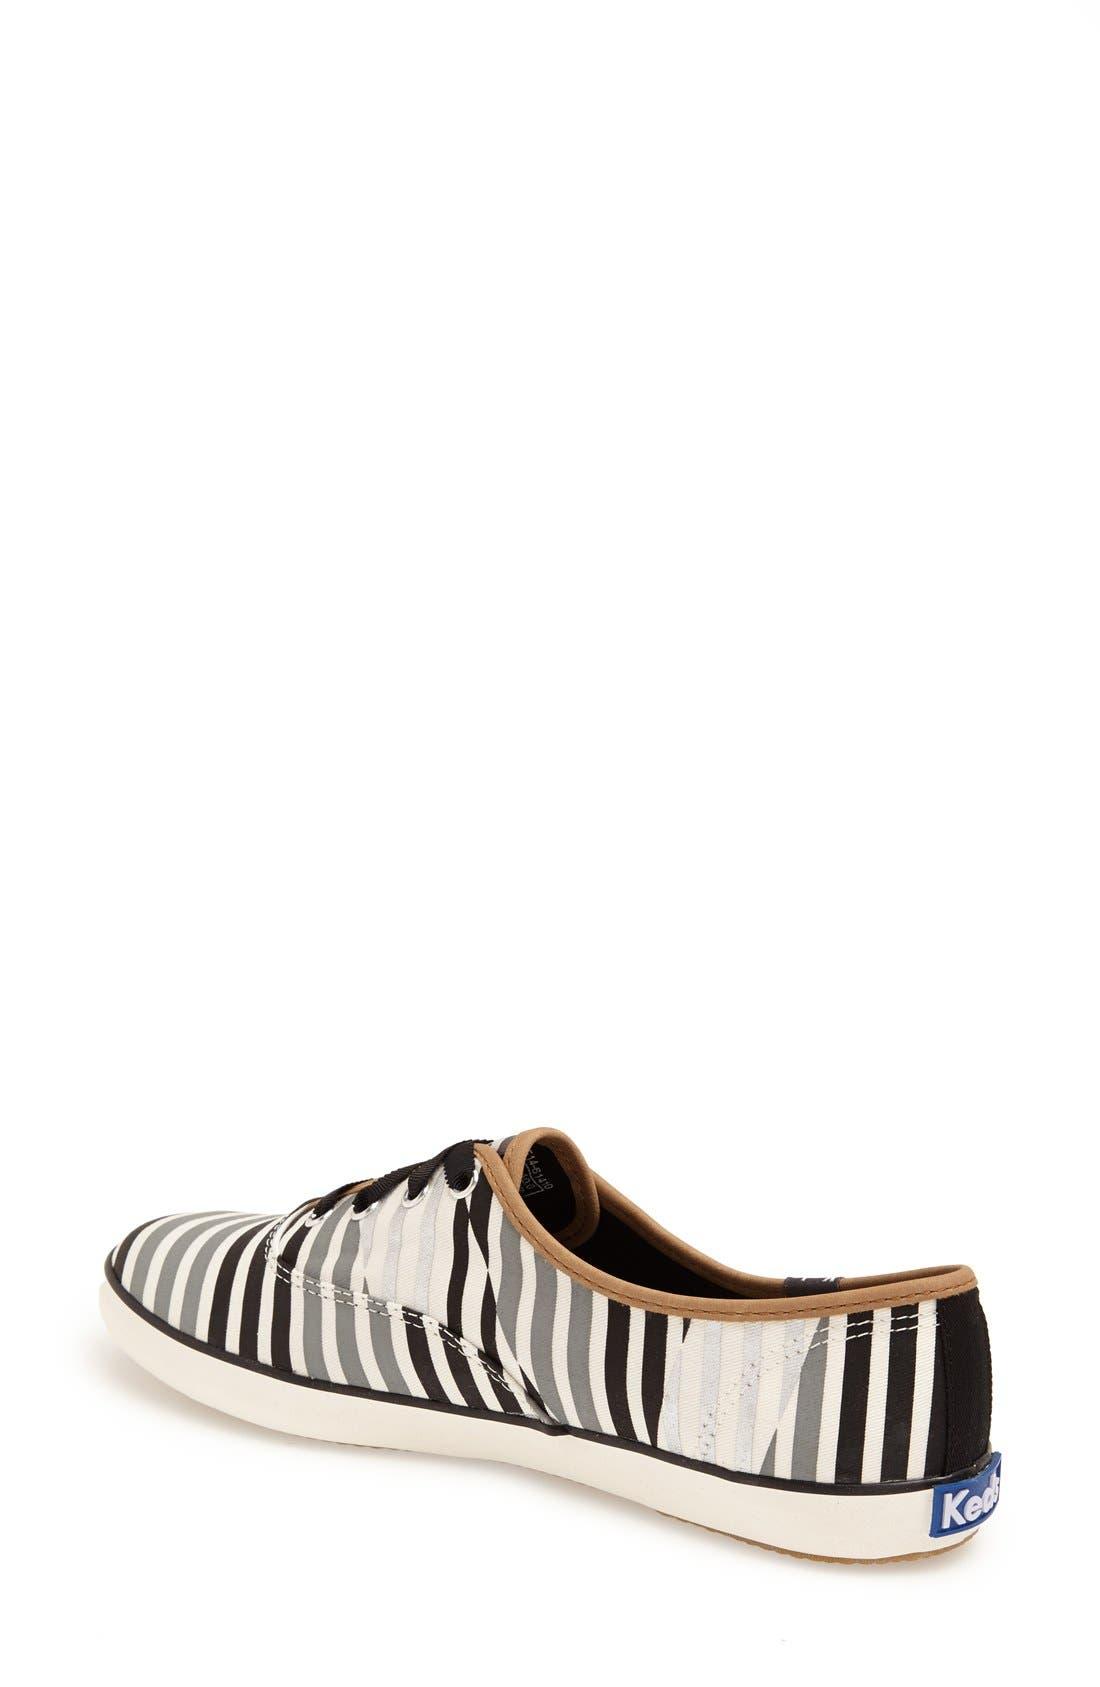 Alternate Image 2  - Keds® 'Champion Stripe' Sneaker (Women)